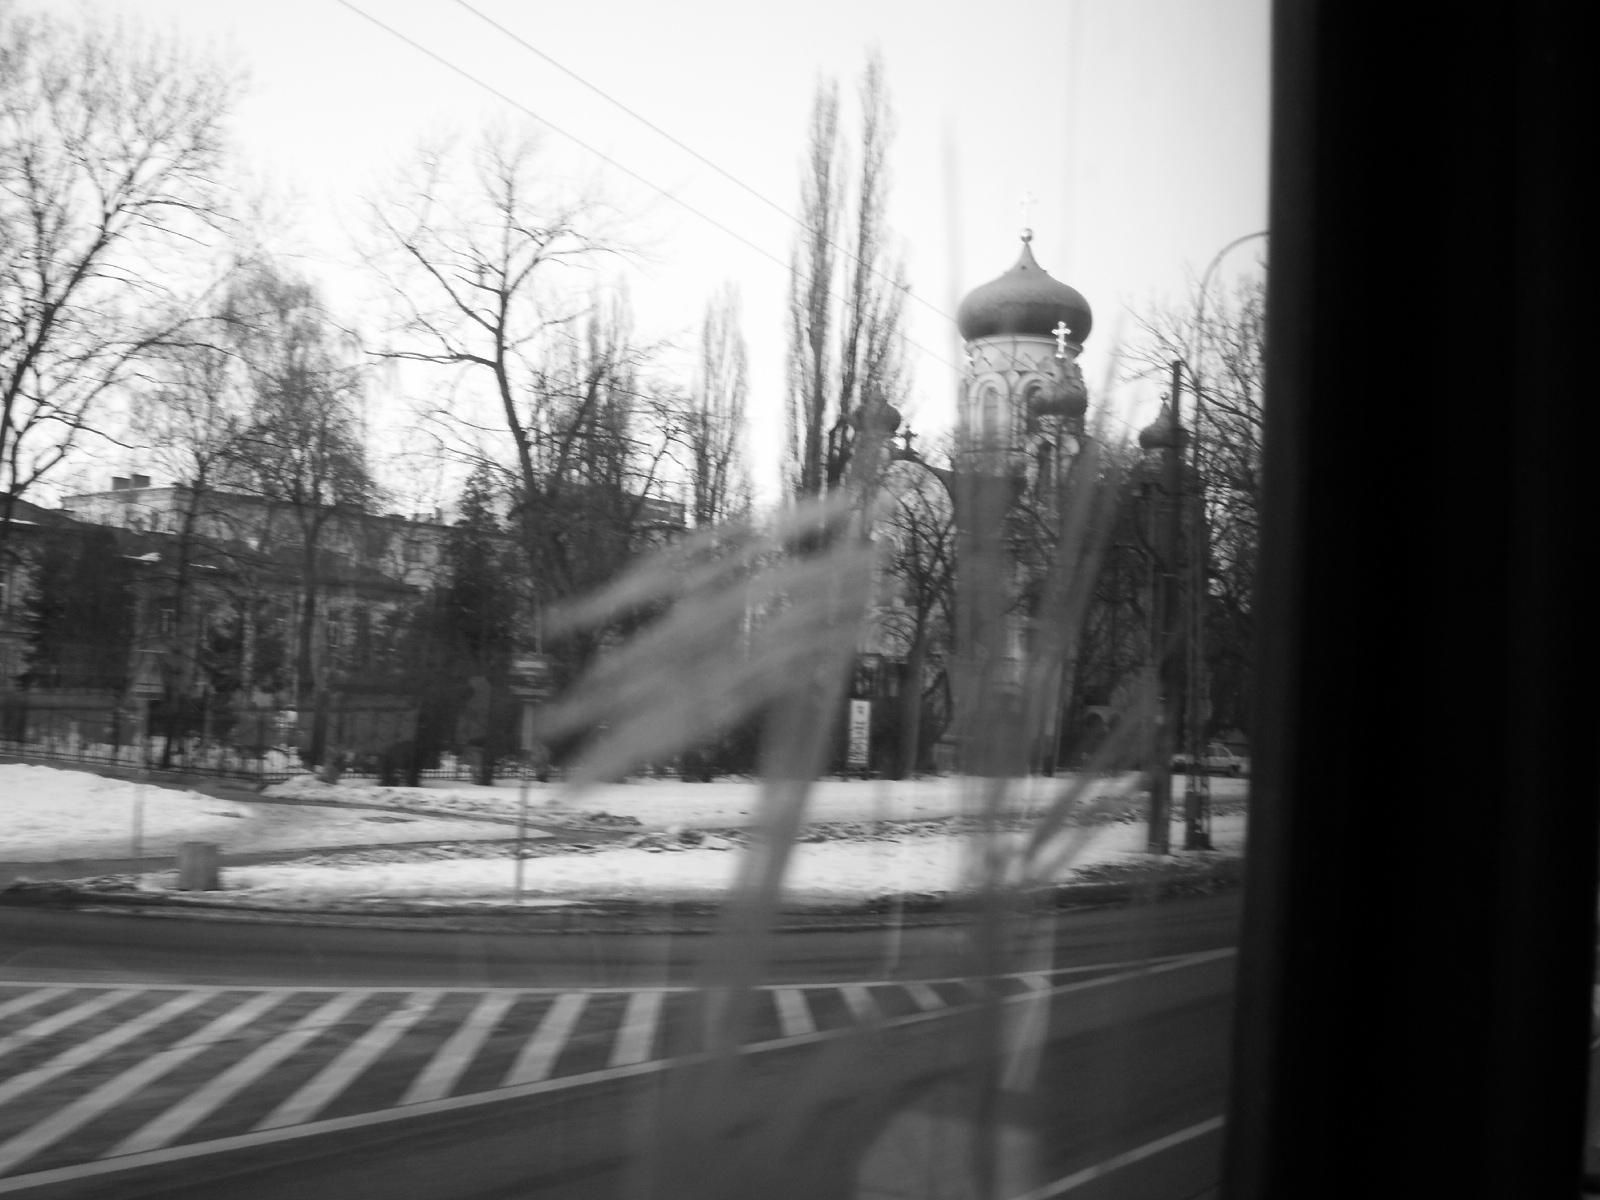 Eglise orthodoxe près du quartier populaire Praga